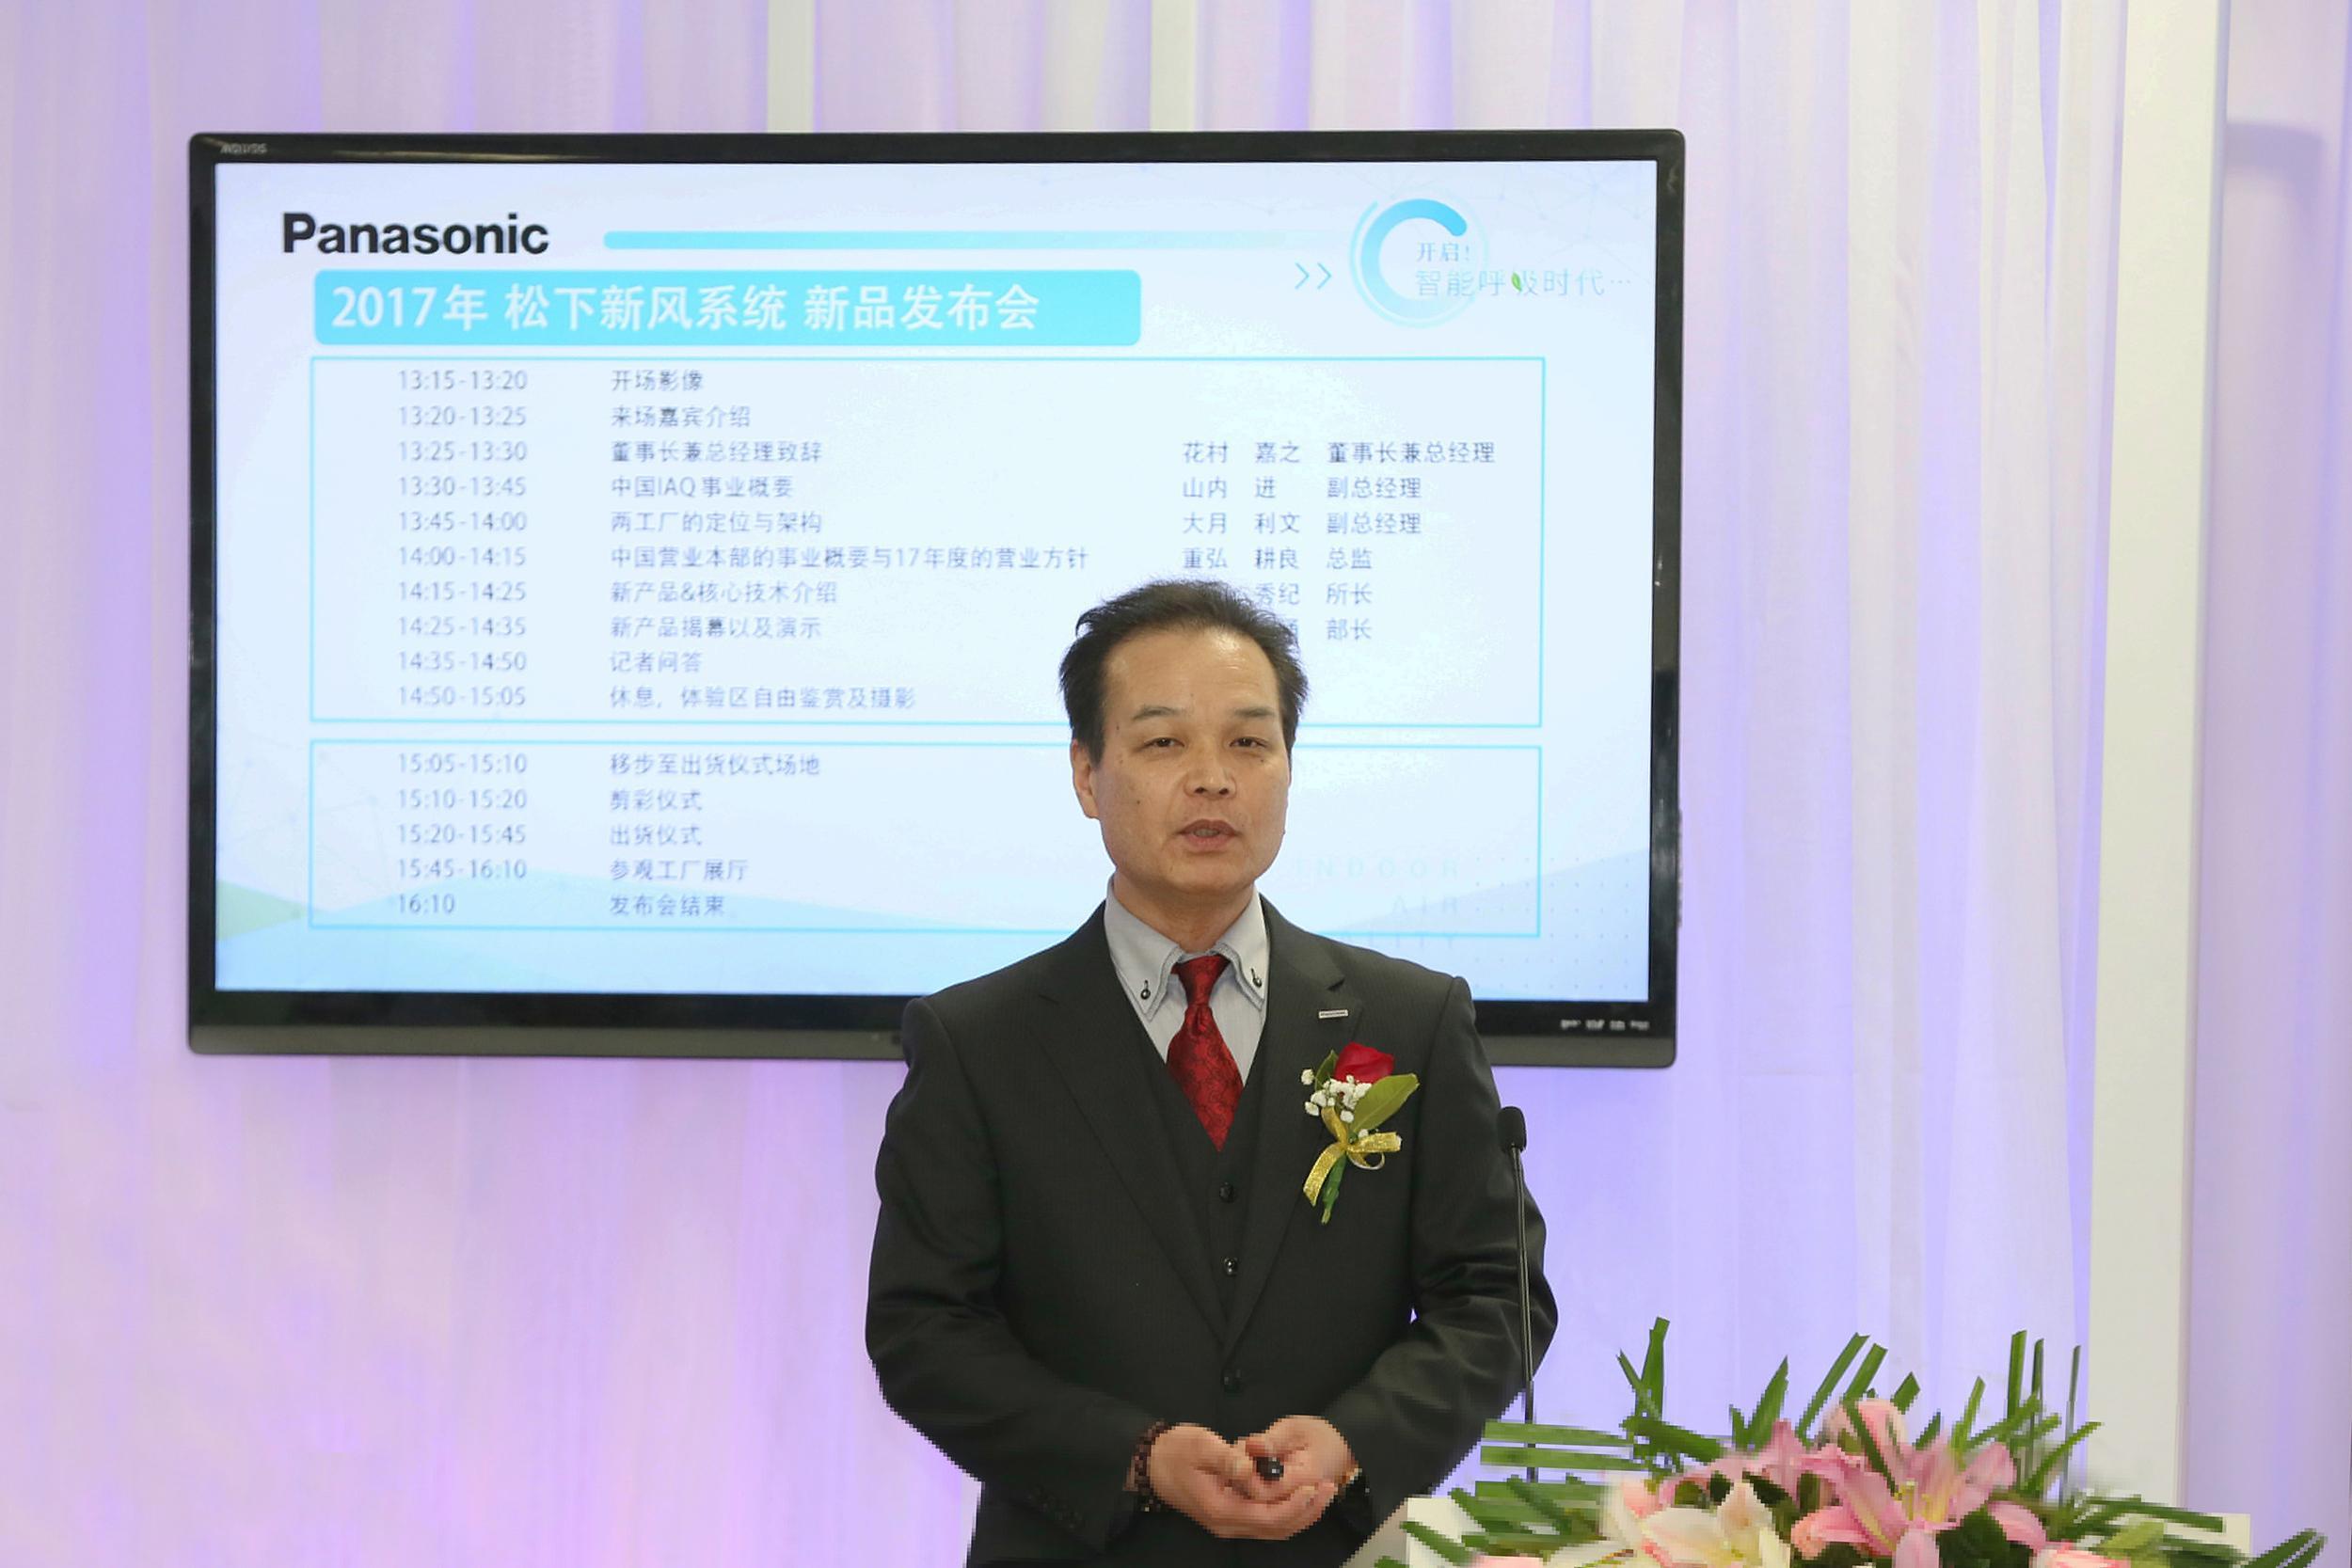 photo: Deputy Managing Director Toshifumi Otsuki